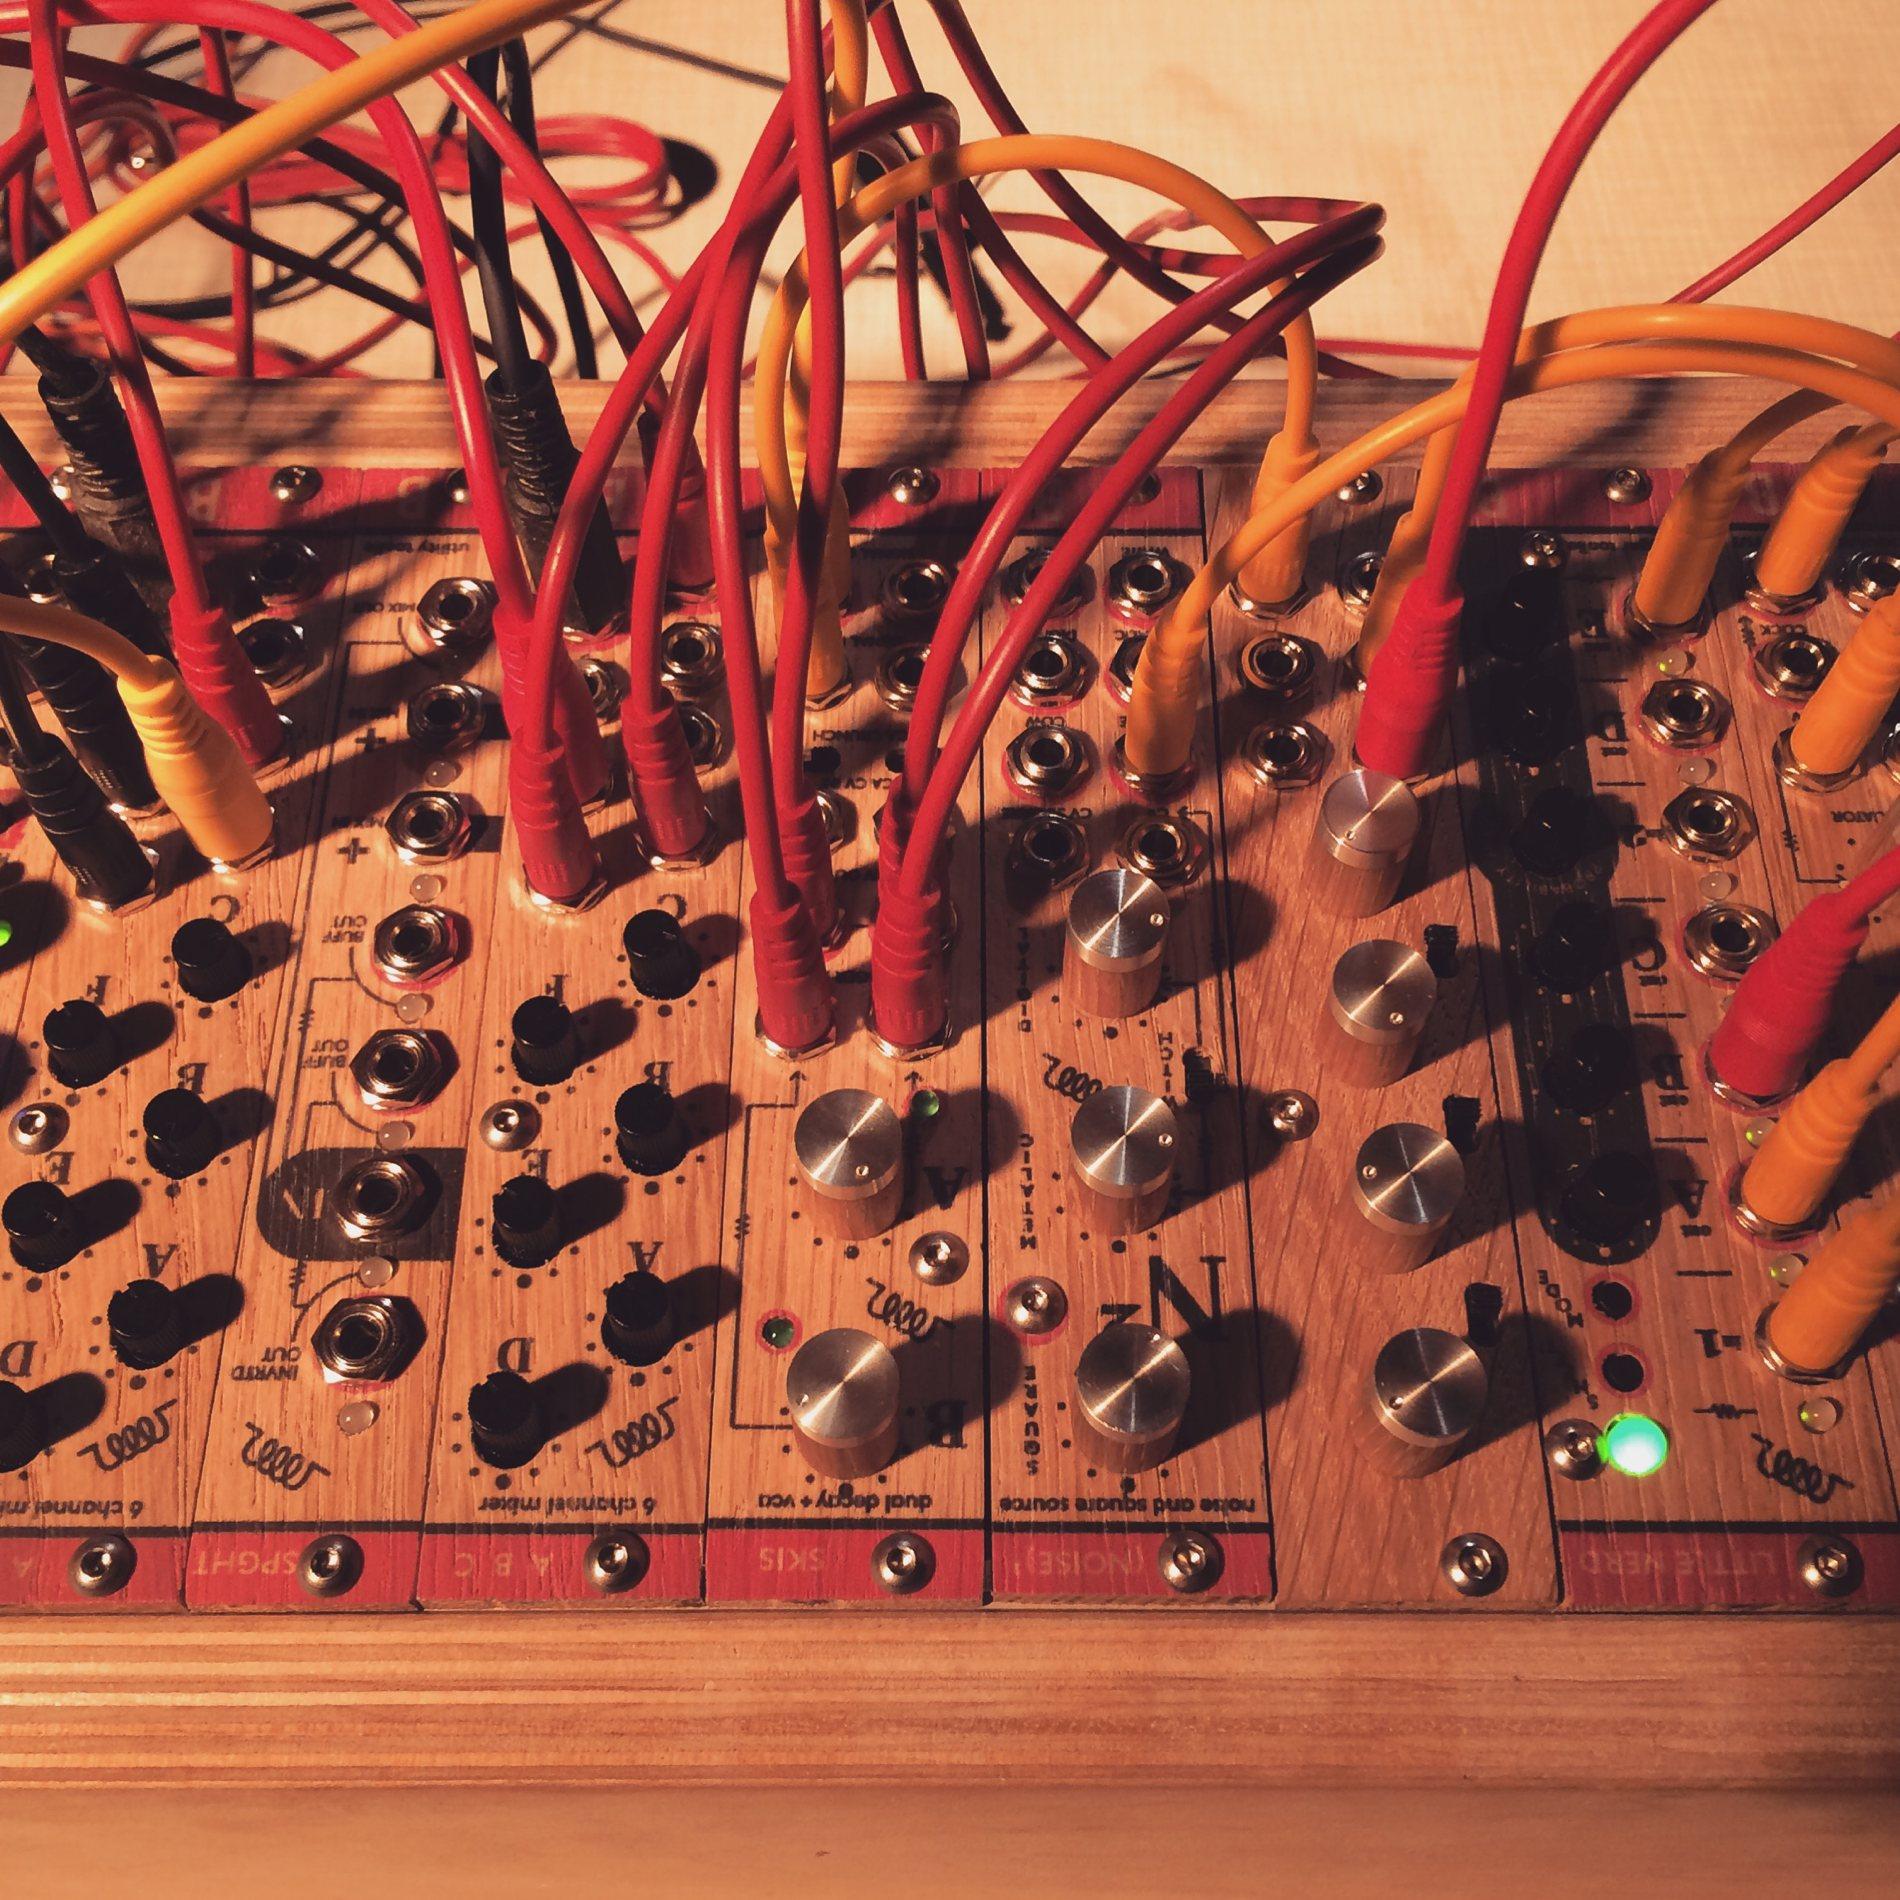 Here's Some Cool Stuff Bastl Instruments Modular Showed Us